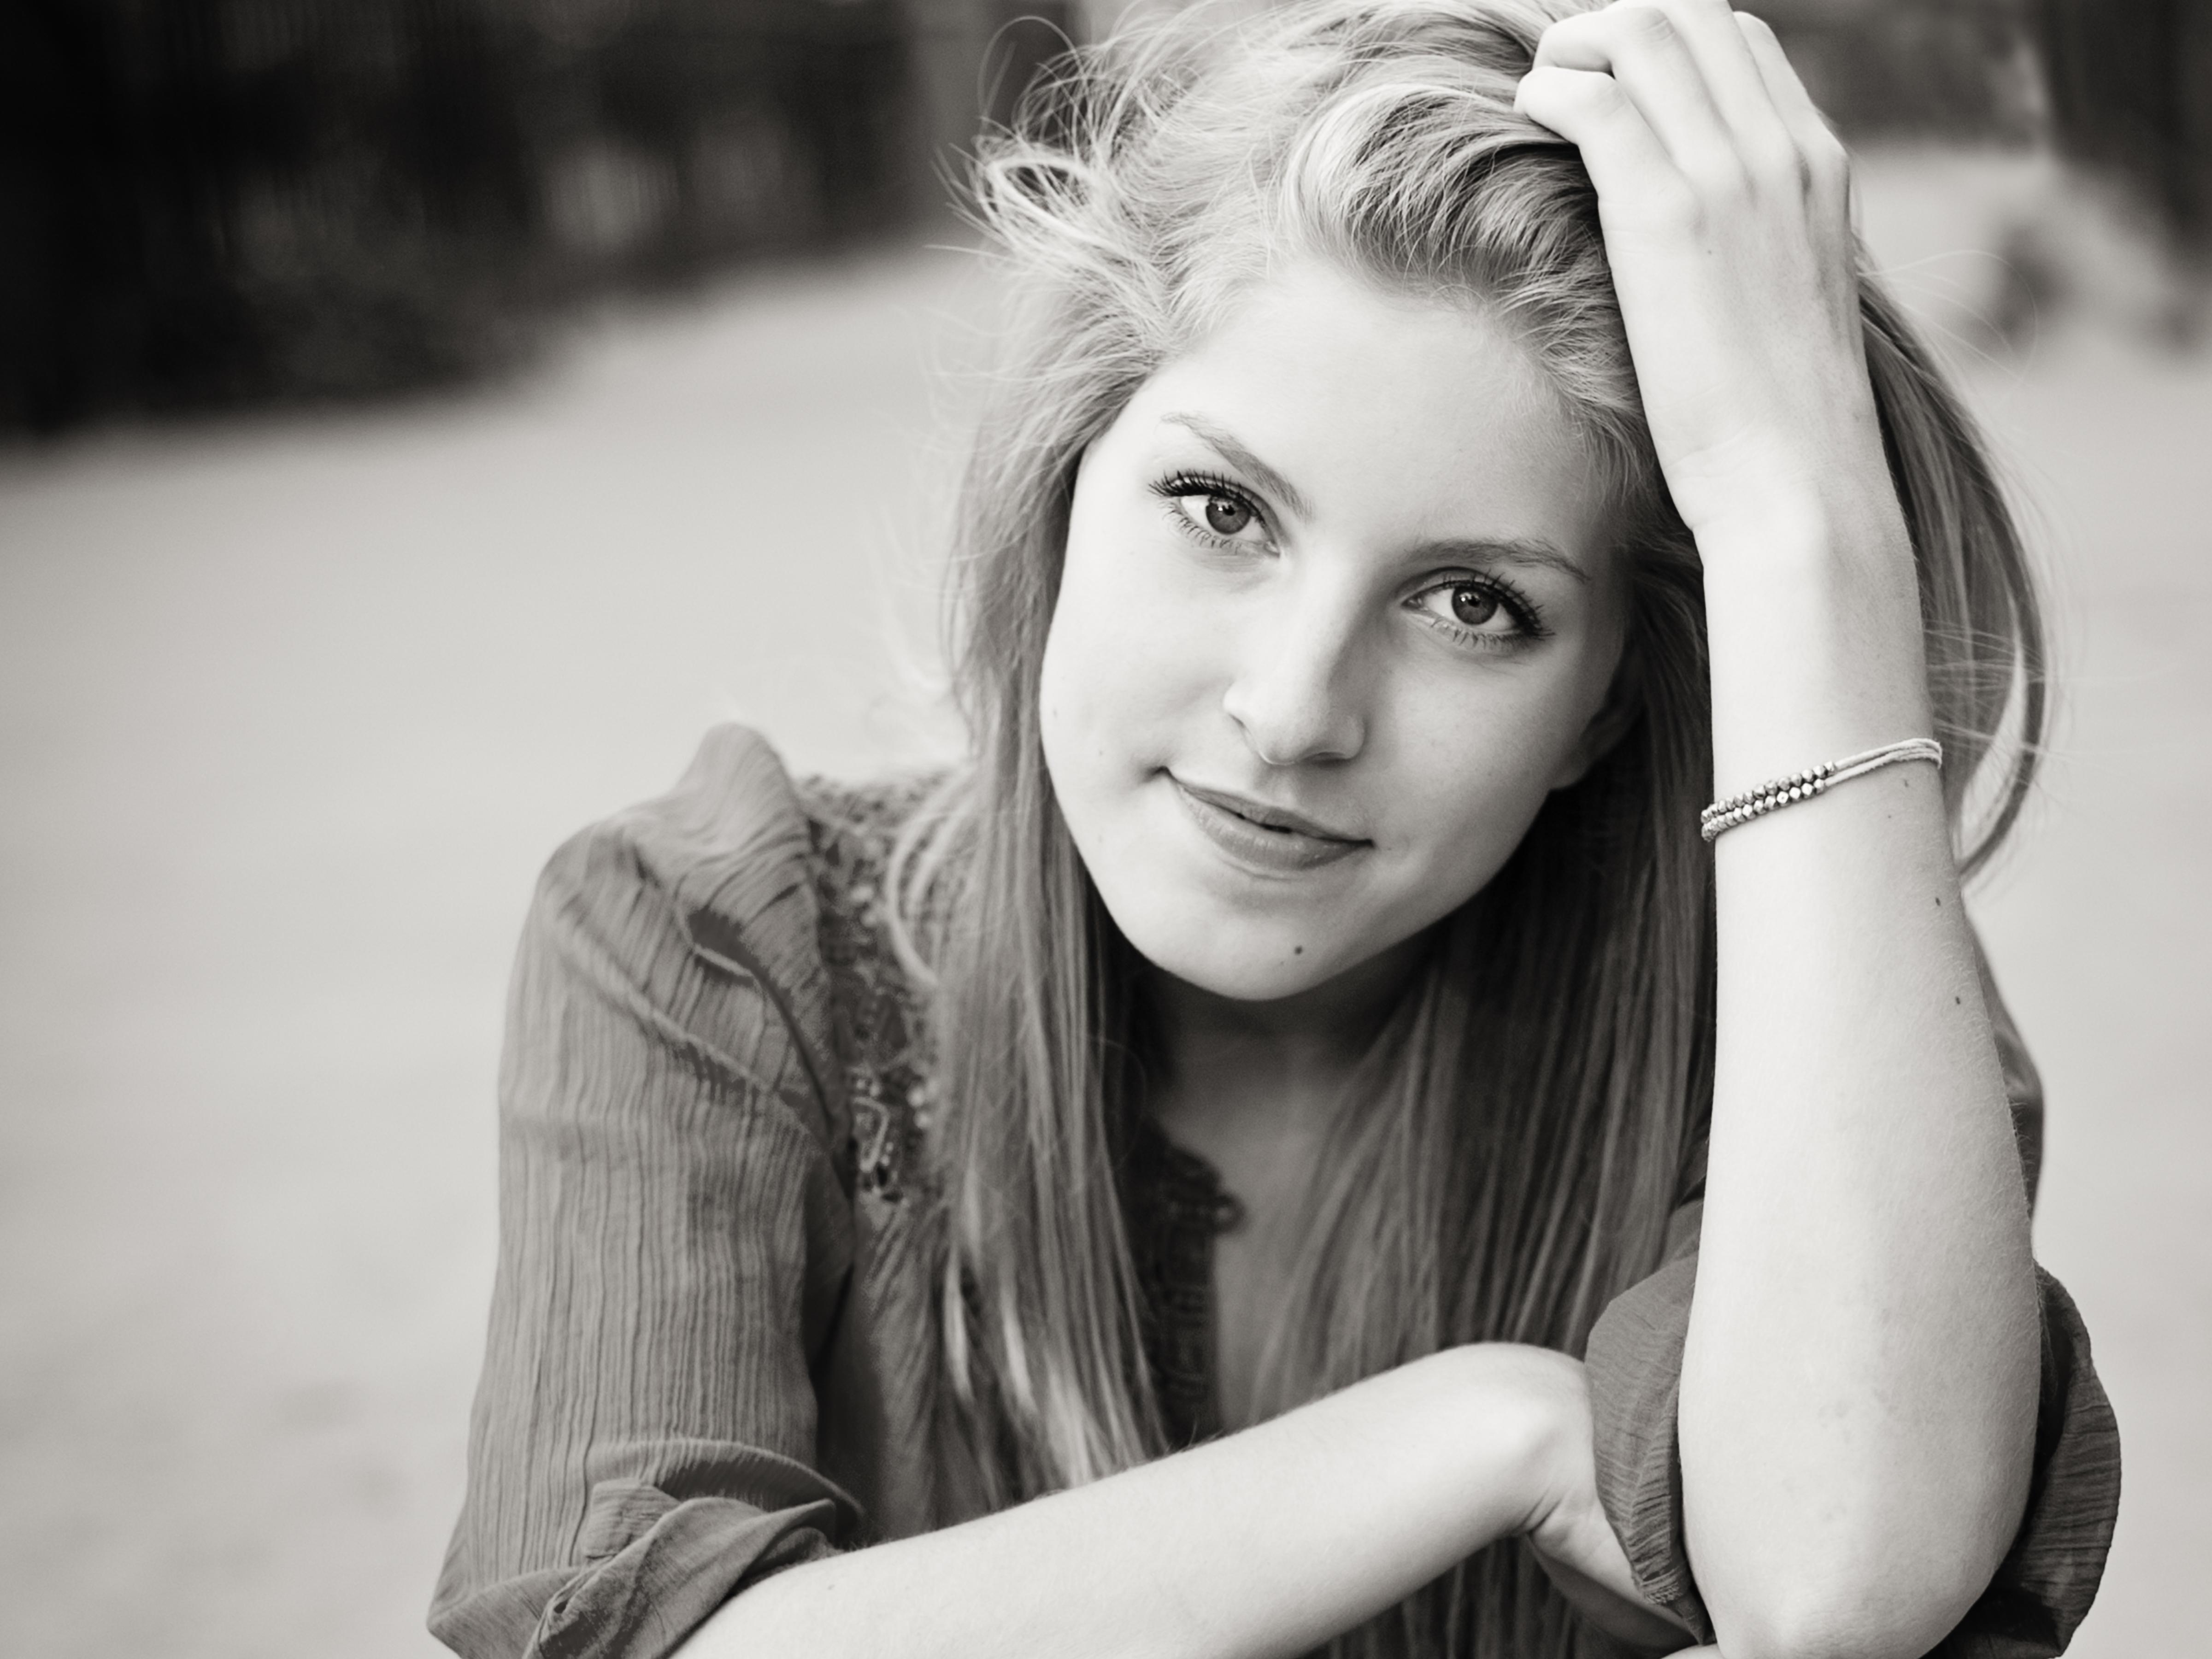 senior girl photography senior photos east oask photography (6)